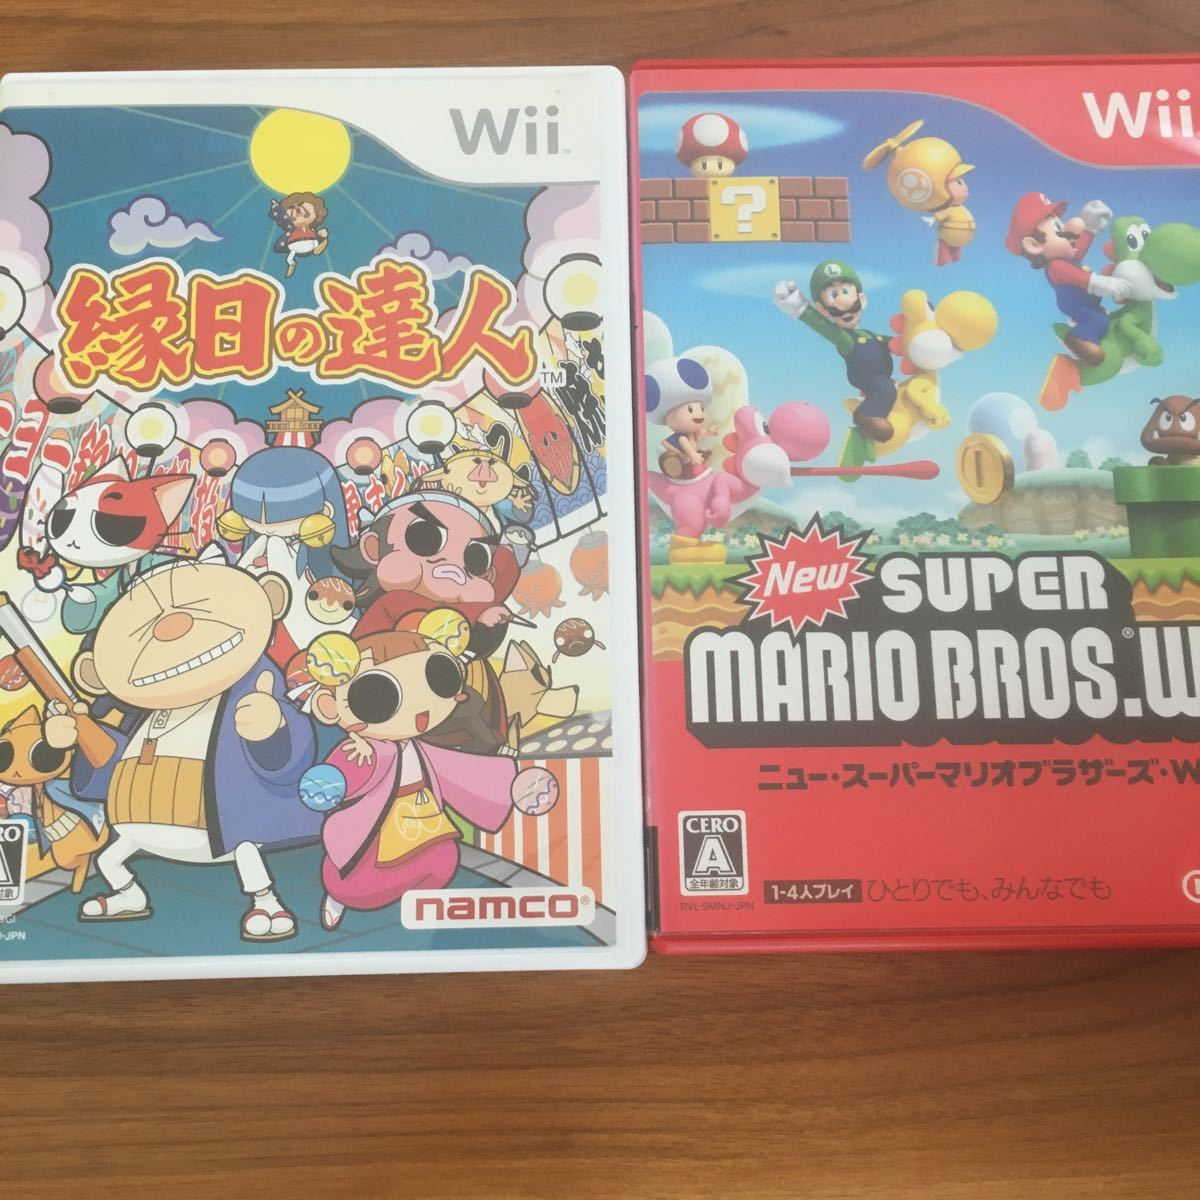 Wii 縁日の達人 ニュースーパーマリオブラザーズ